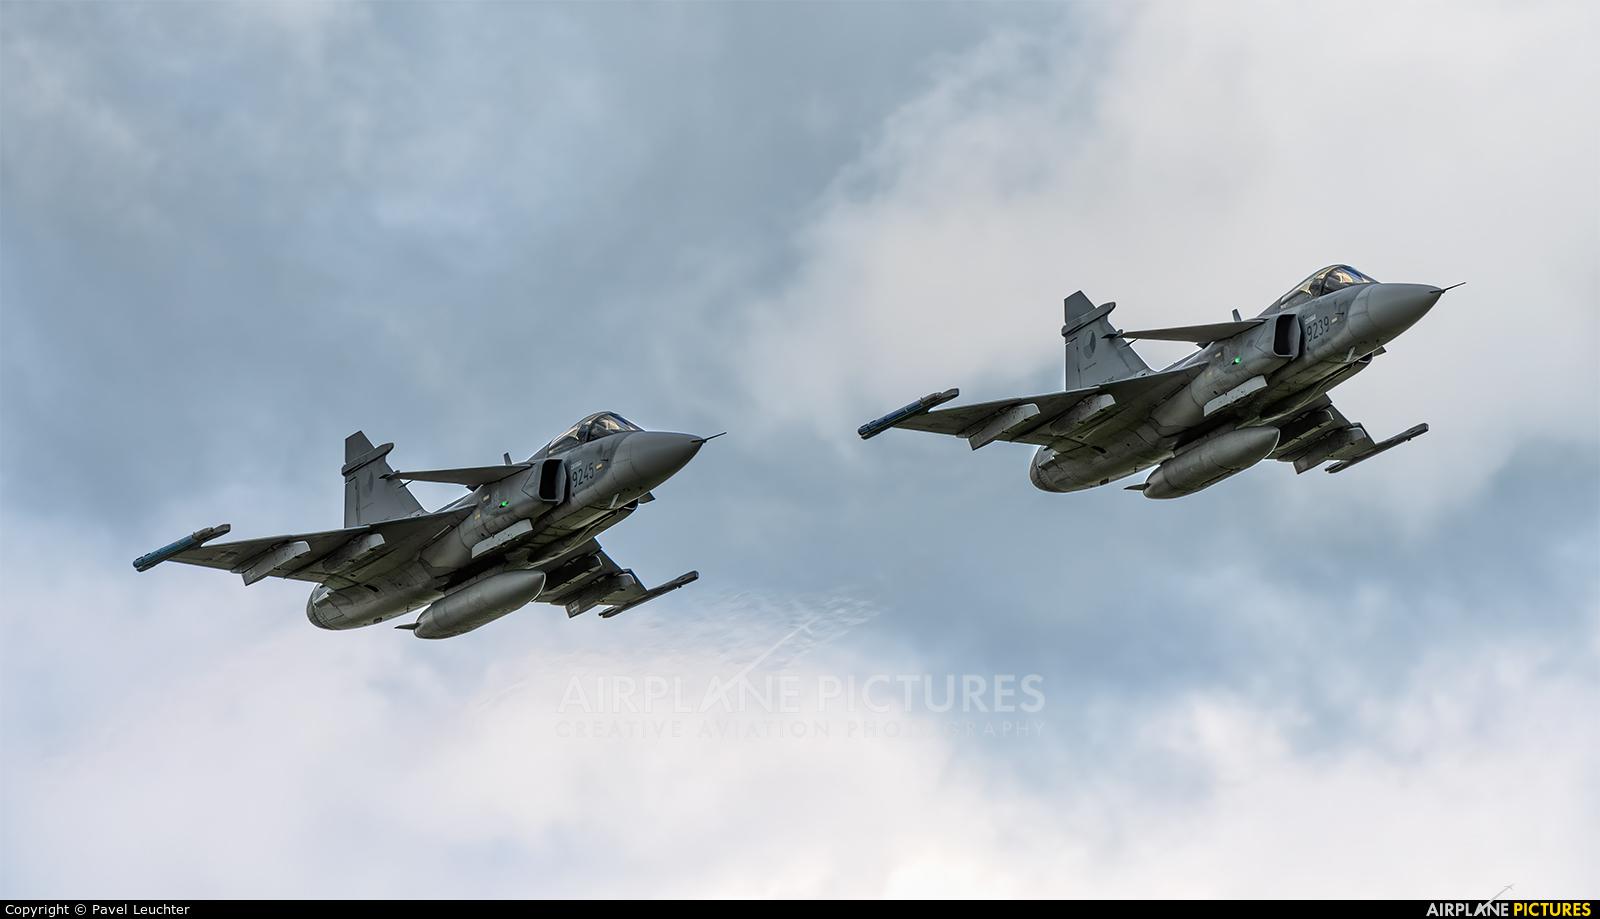 Czech - Air Force 9239 aircraft at Pardubice